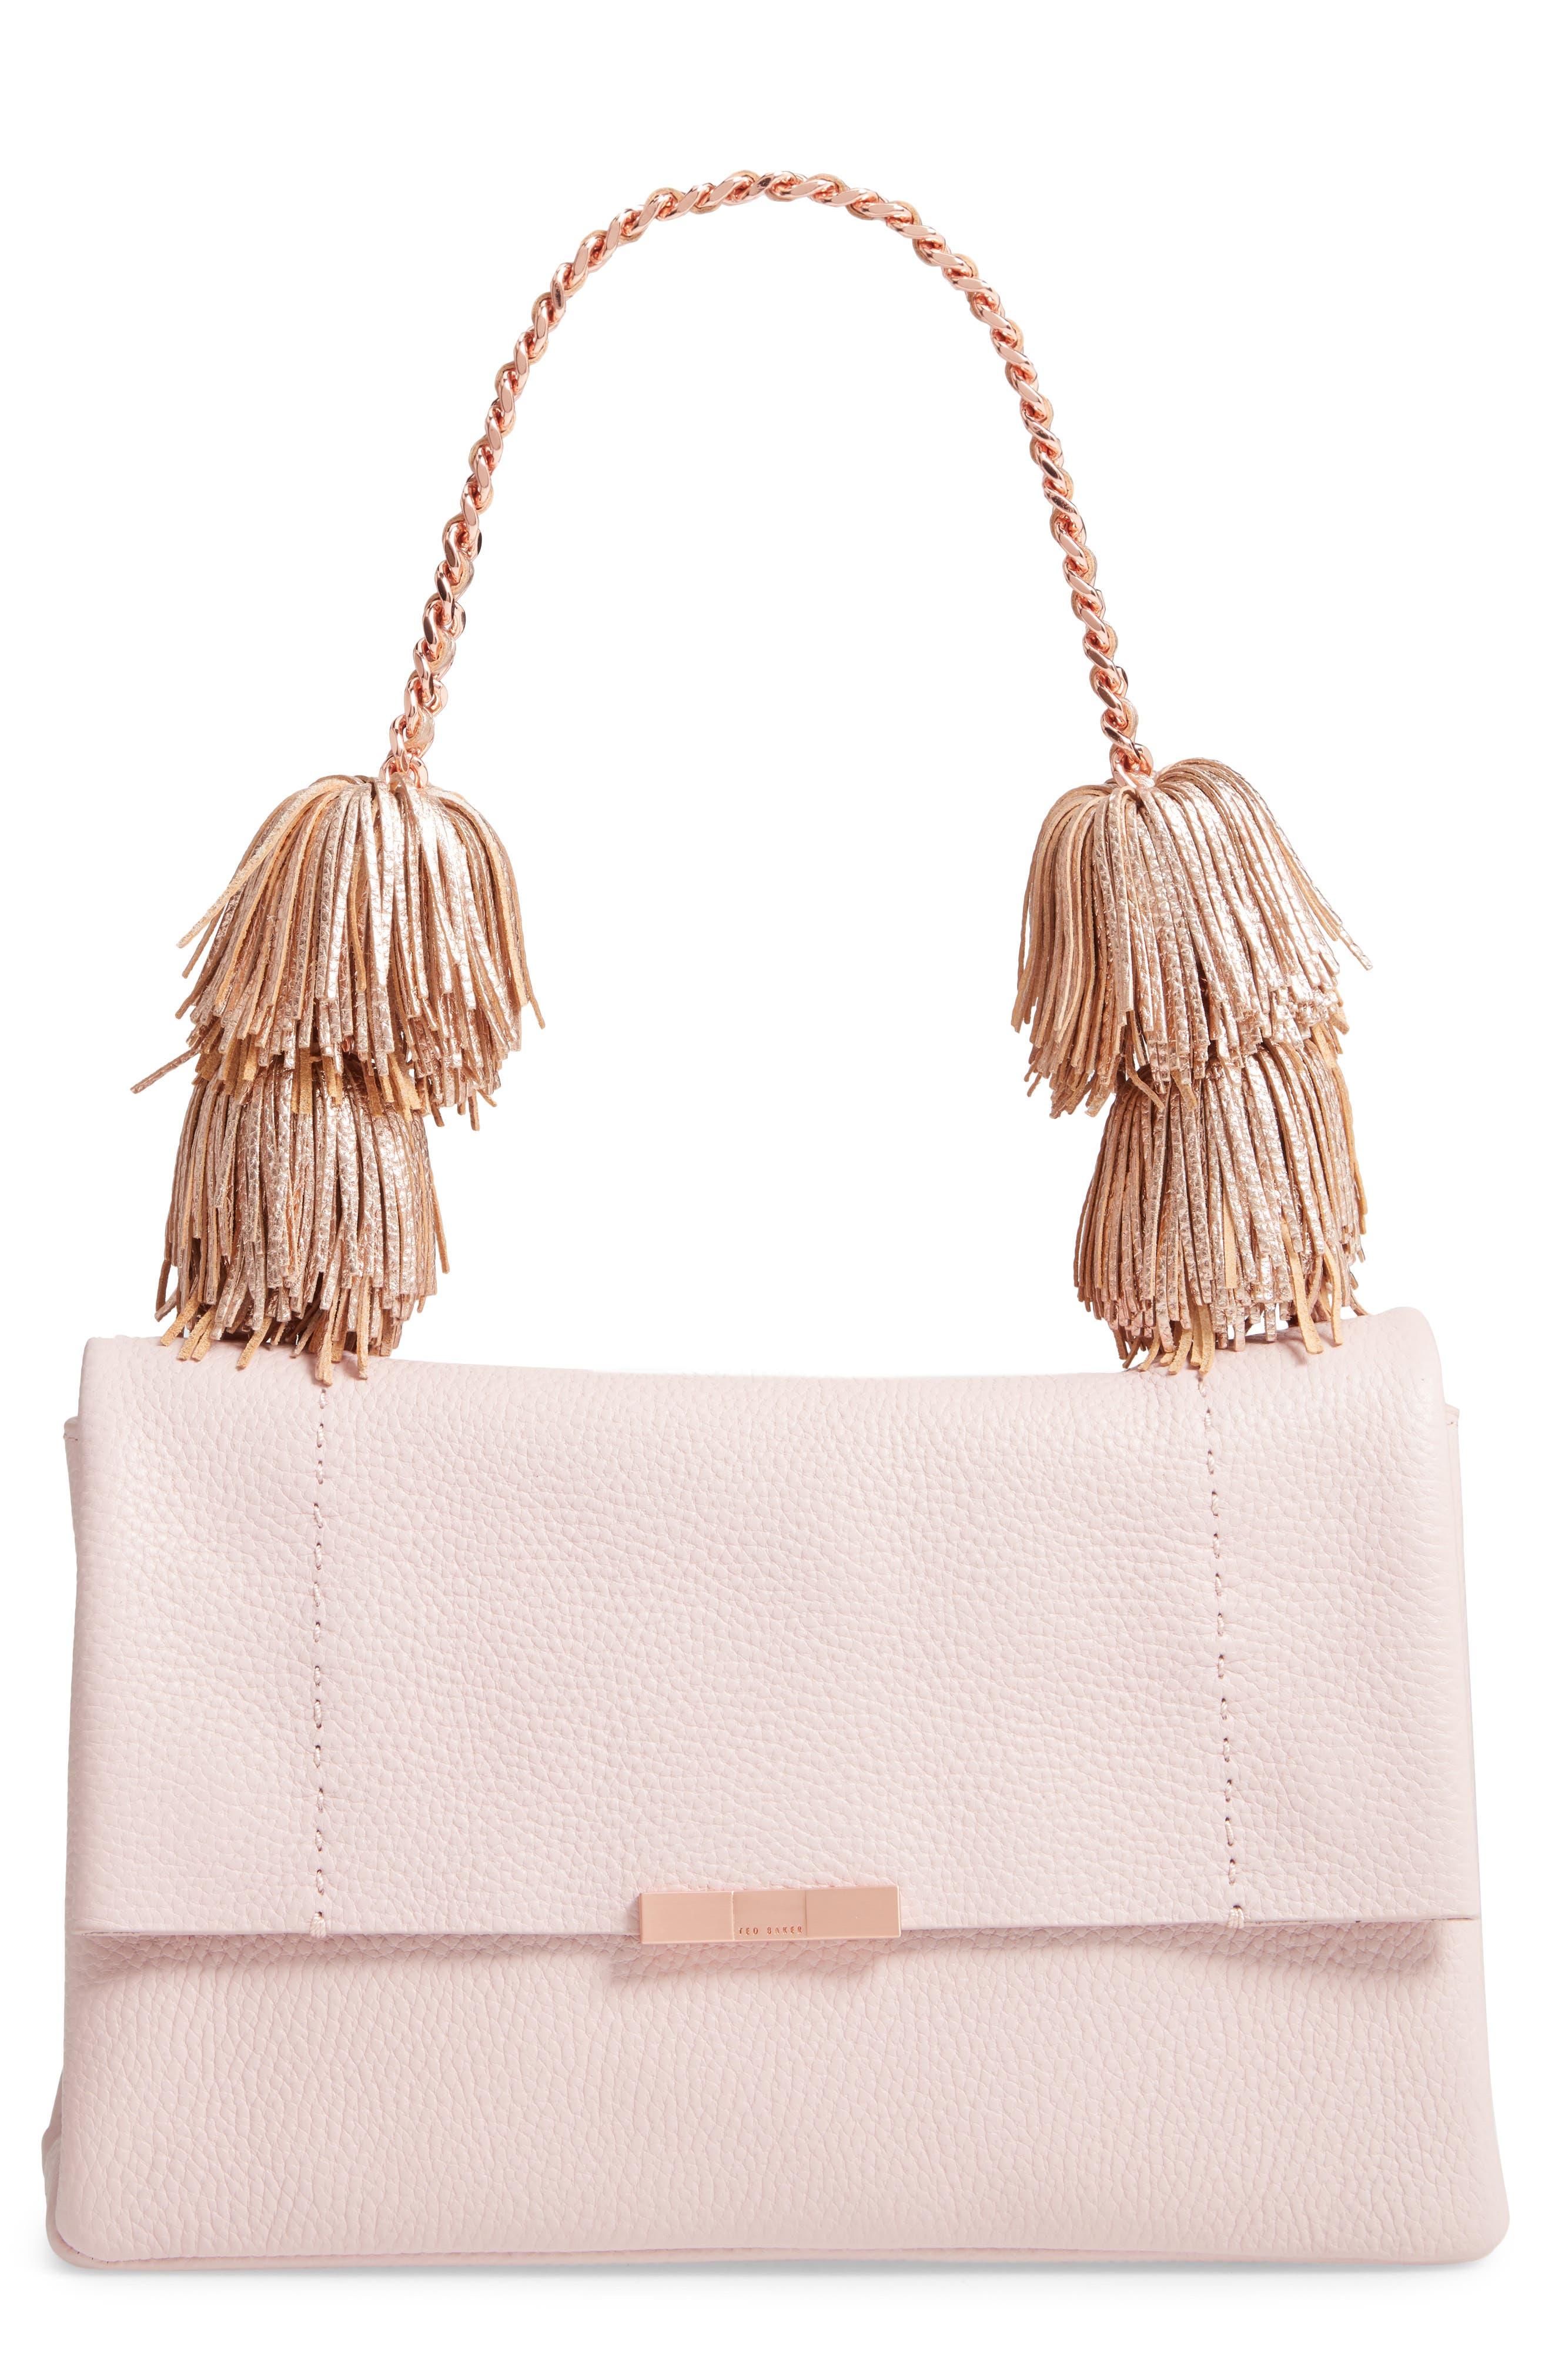 Melody Pom Leather Shoulder Bag,                             Main thumbnail 1, color,                             PALE PINK